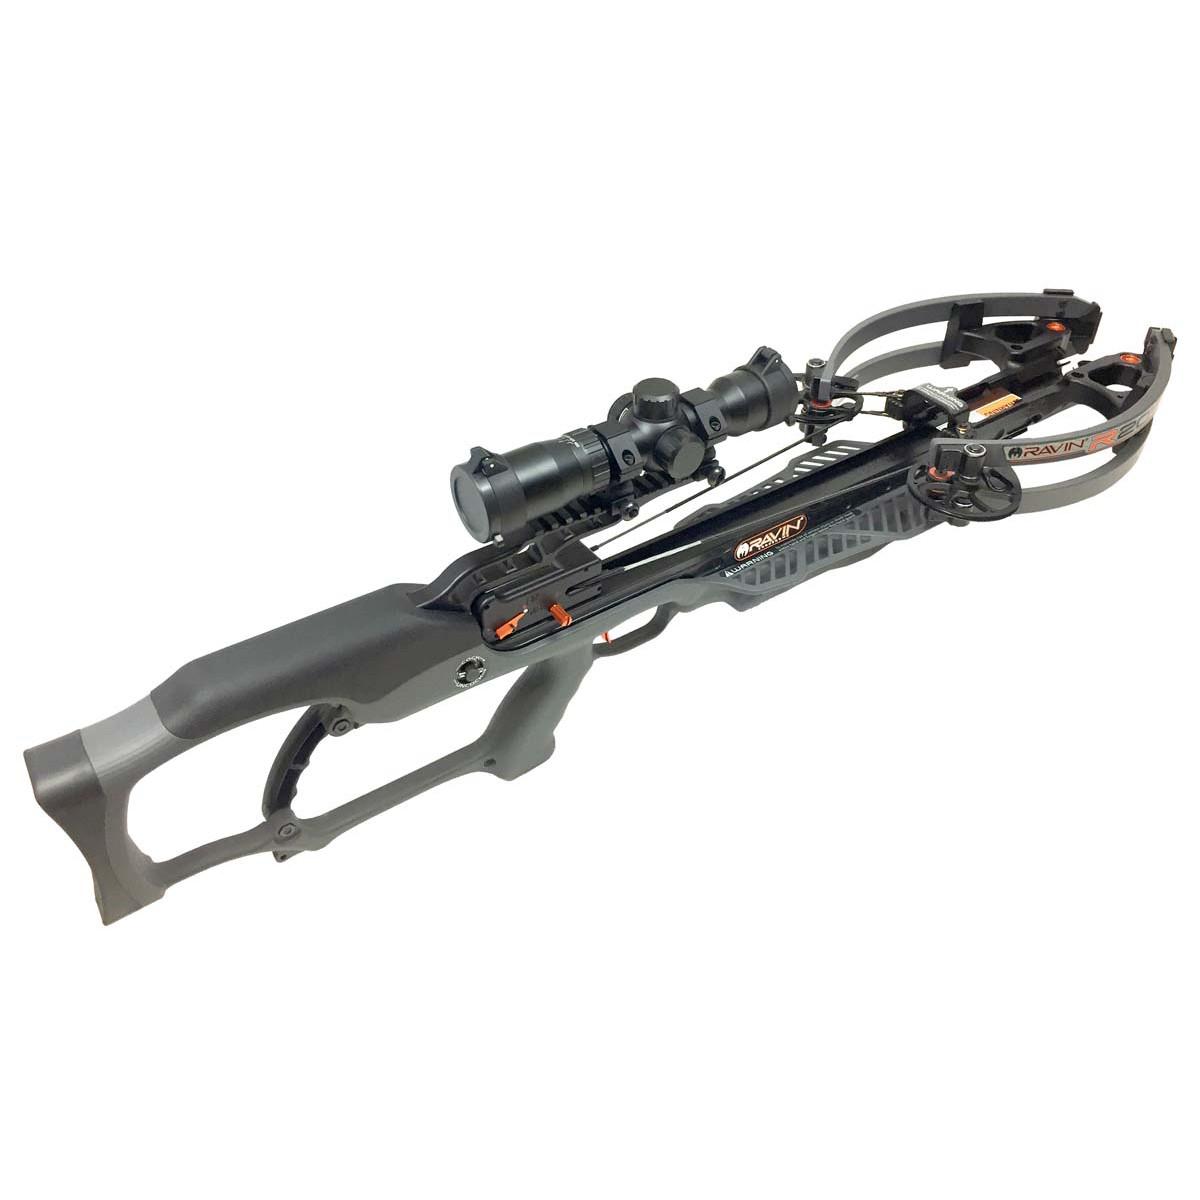 Hunting > Archery > Crossbows